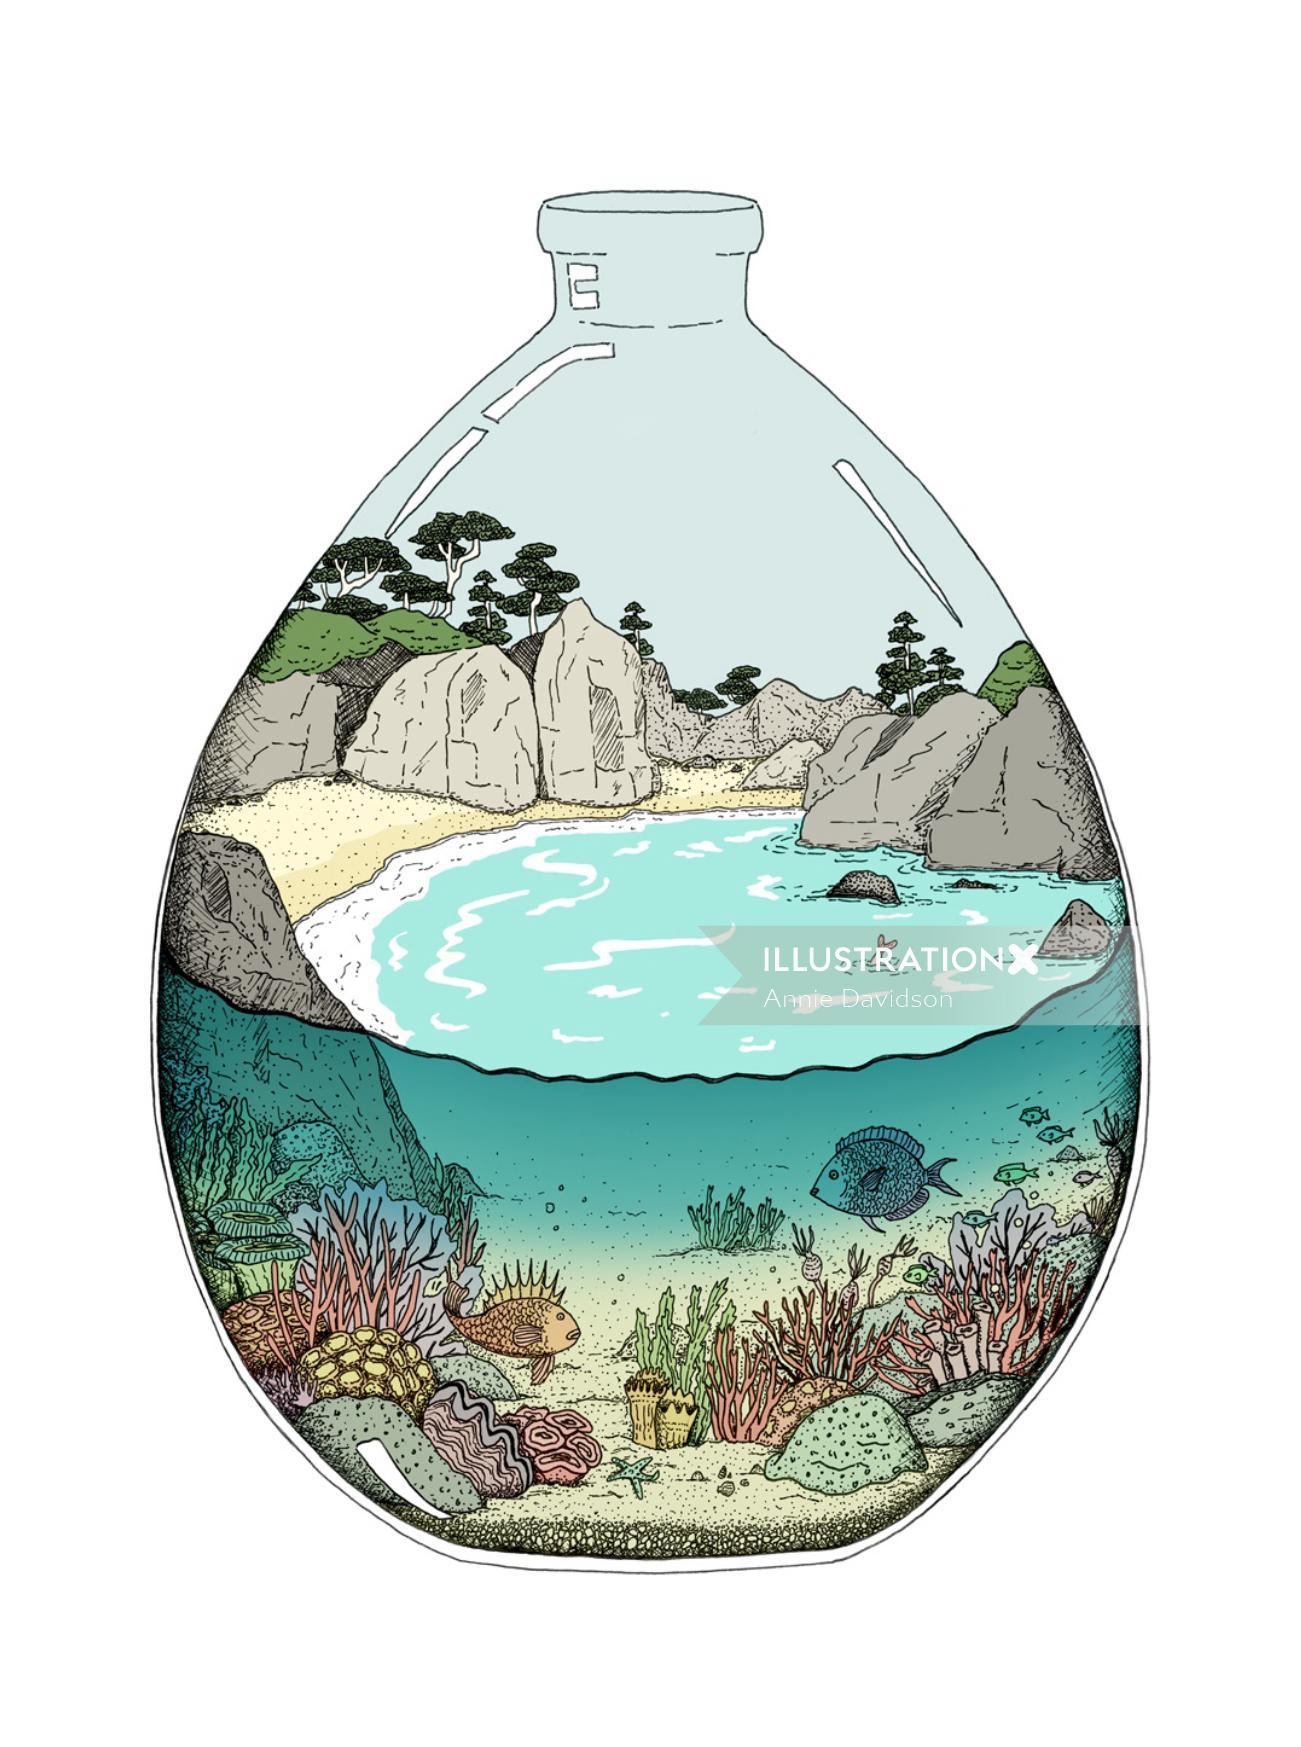 illustration, bay beach, under water, coral reef, fish, seaweed, sand